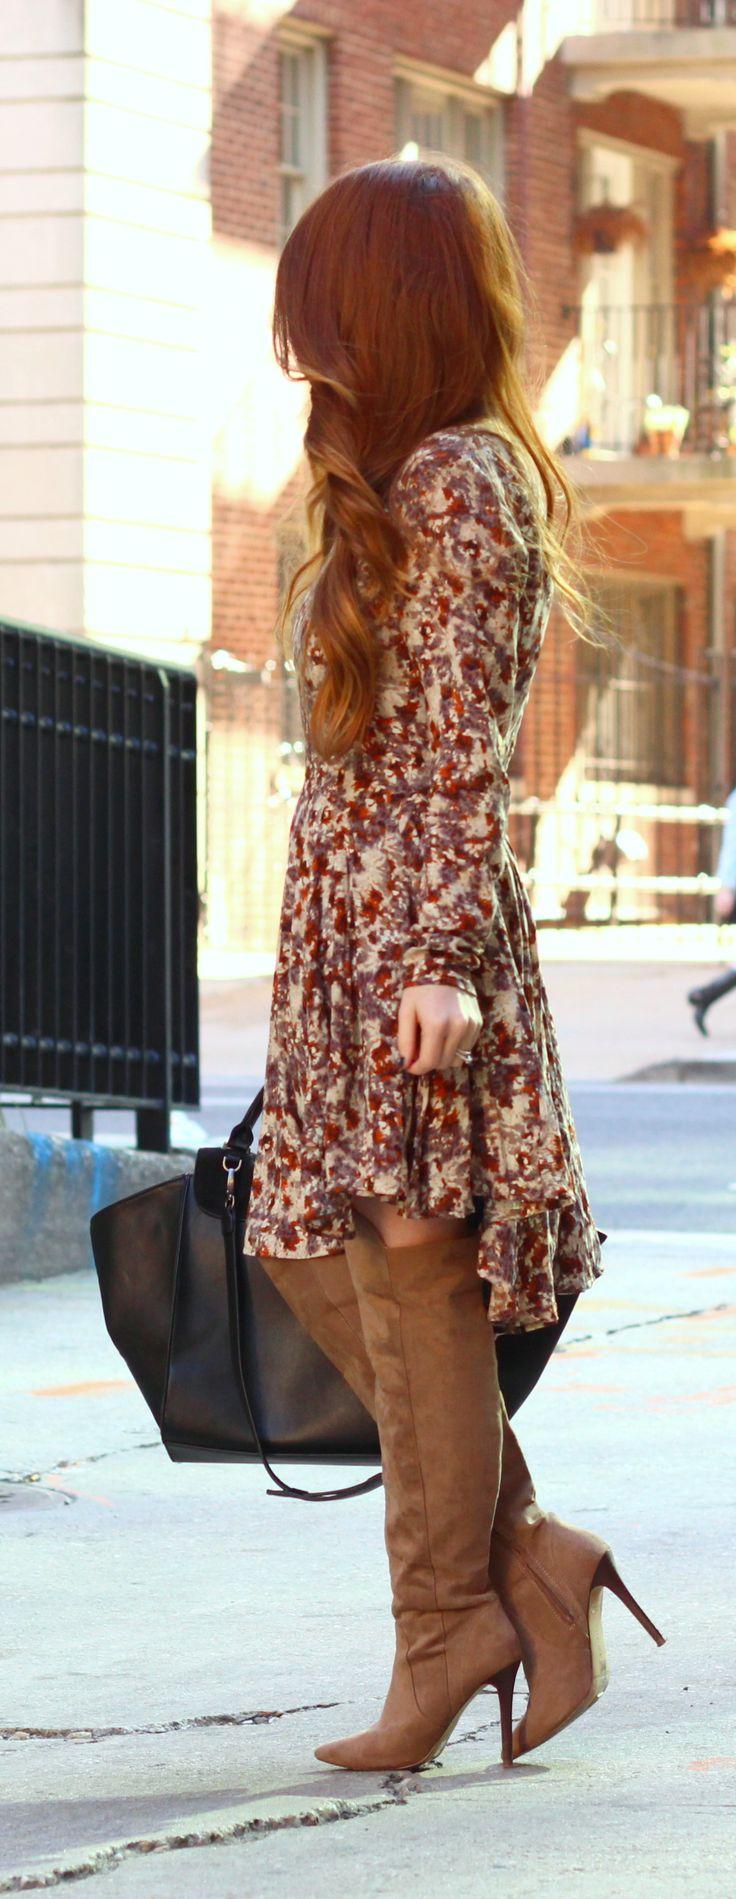 Boho dress + over the knee boots